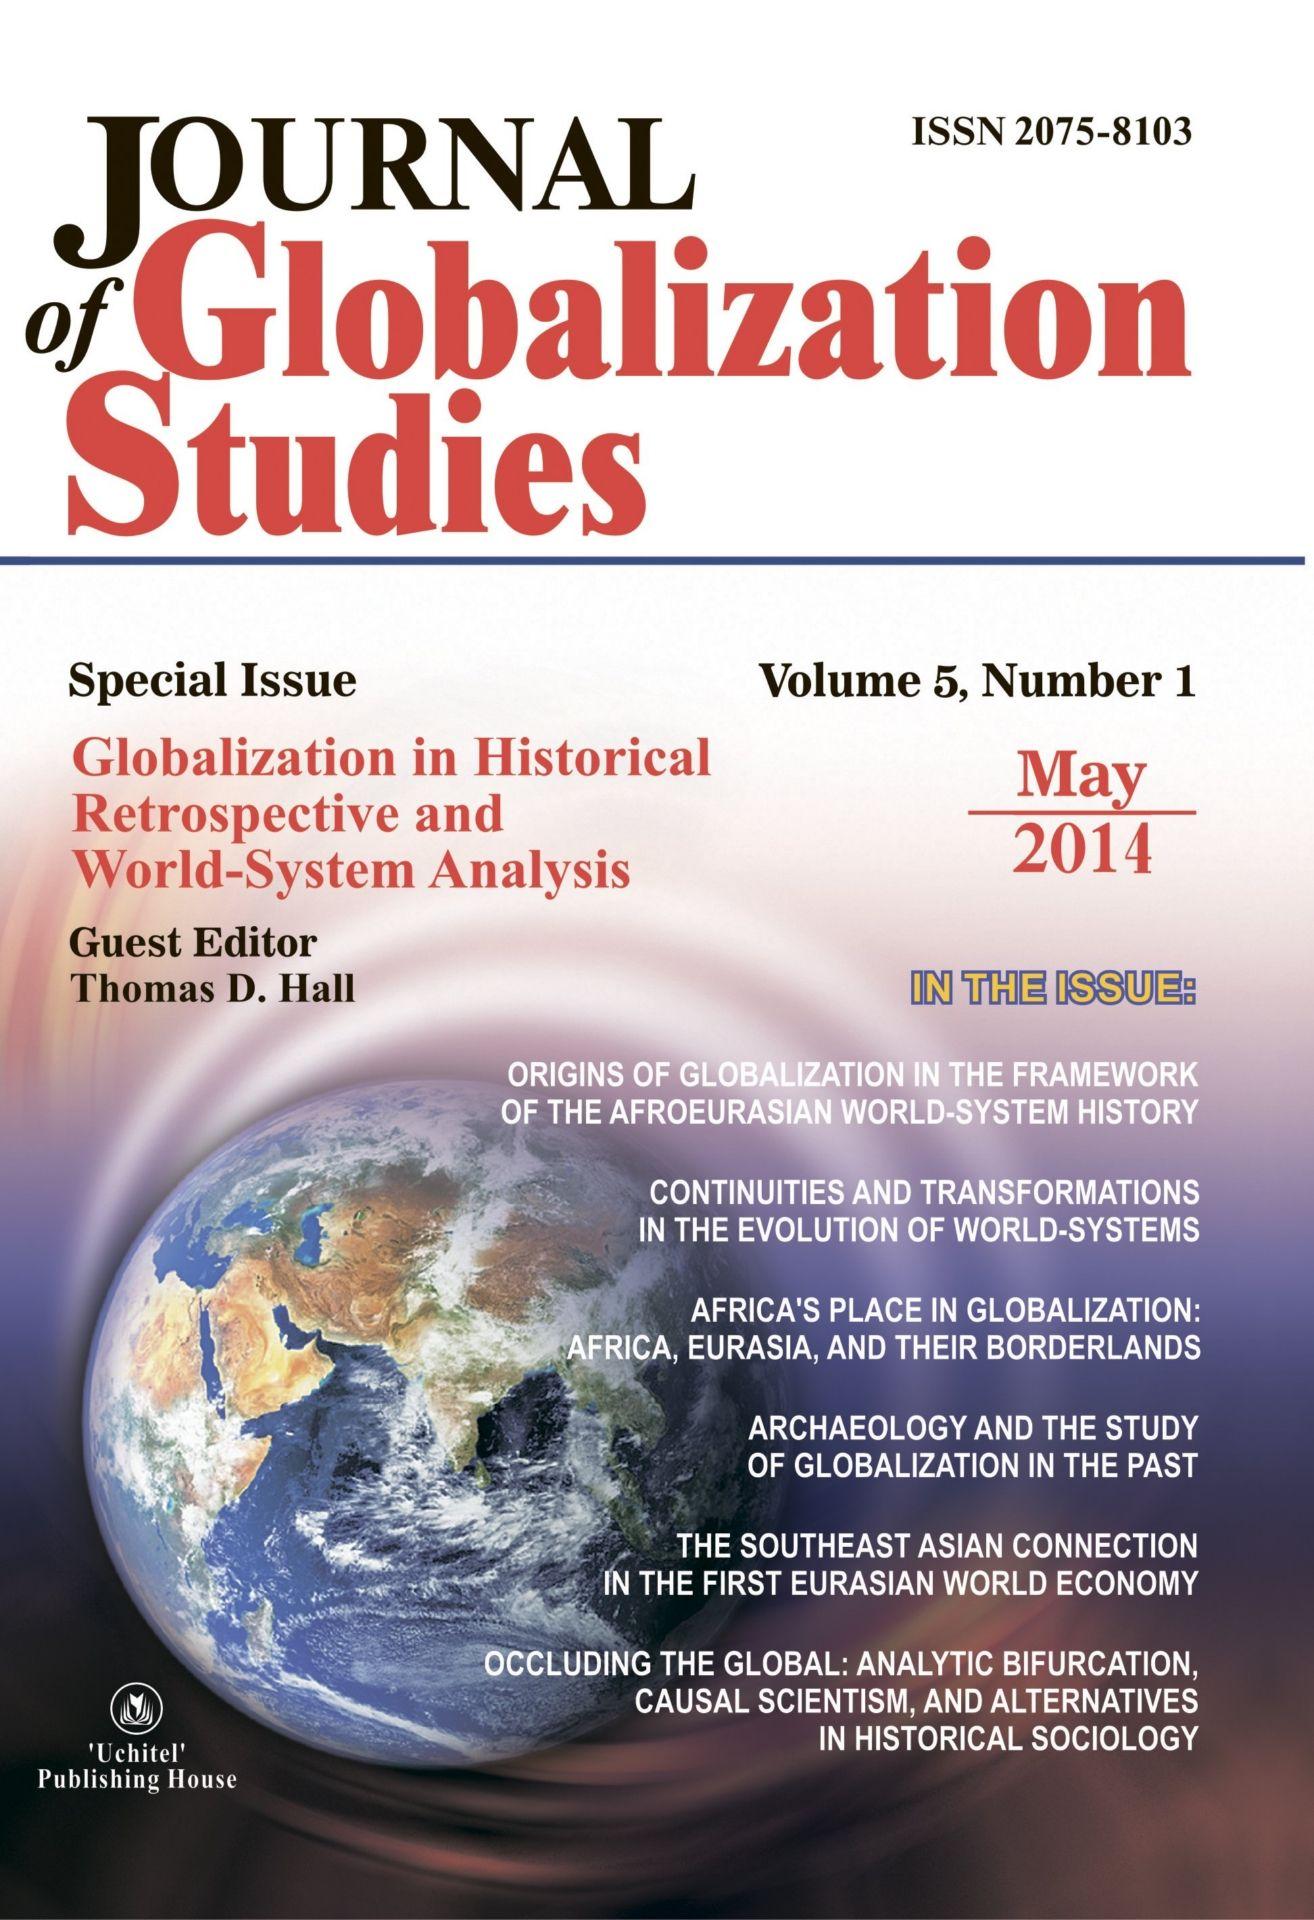 Journal of Globalization Studies Volume 5, Number 1, 2014 г. Журнал глобализационных исследований Международный журнал на английском языке